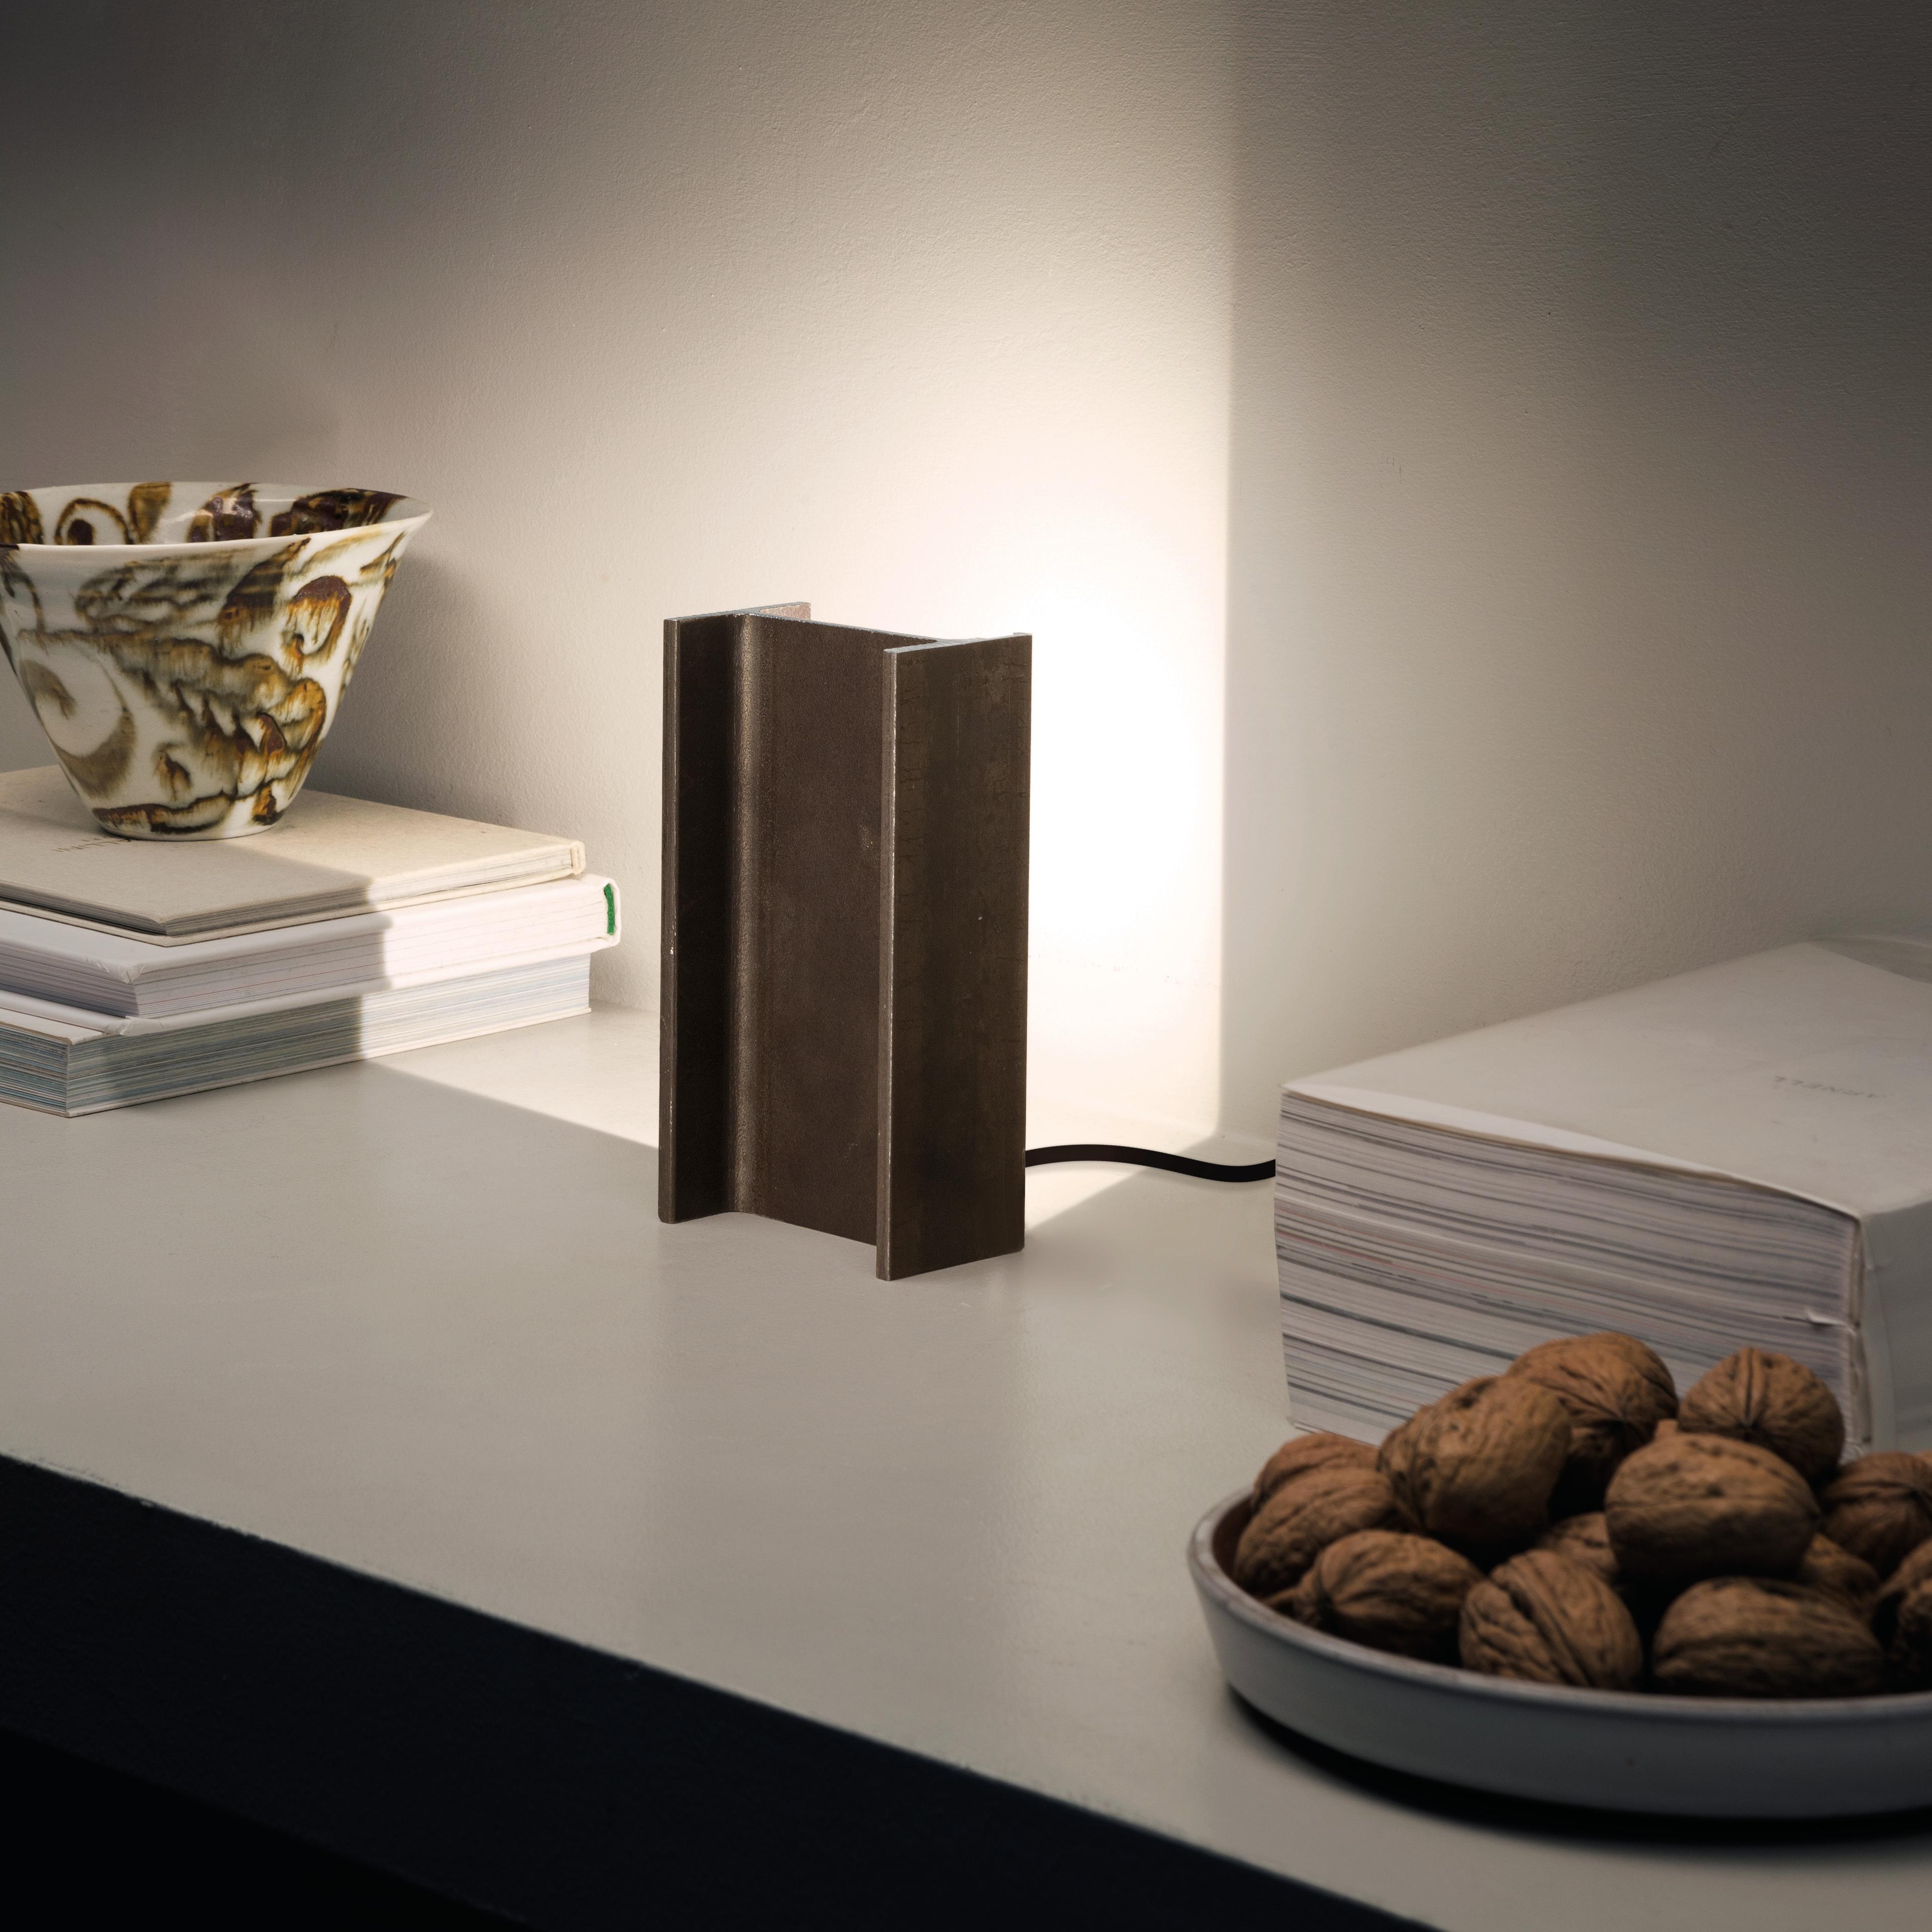 Table Lamp Mais Plus Que Cela Je Ne Peux Pas Mini Grey Led L8cm H15cm Nemo Lighting Nedgis Lighting